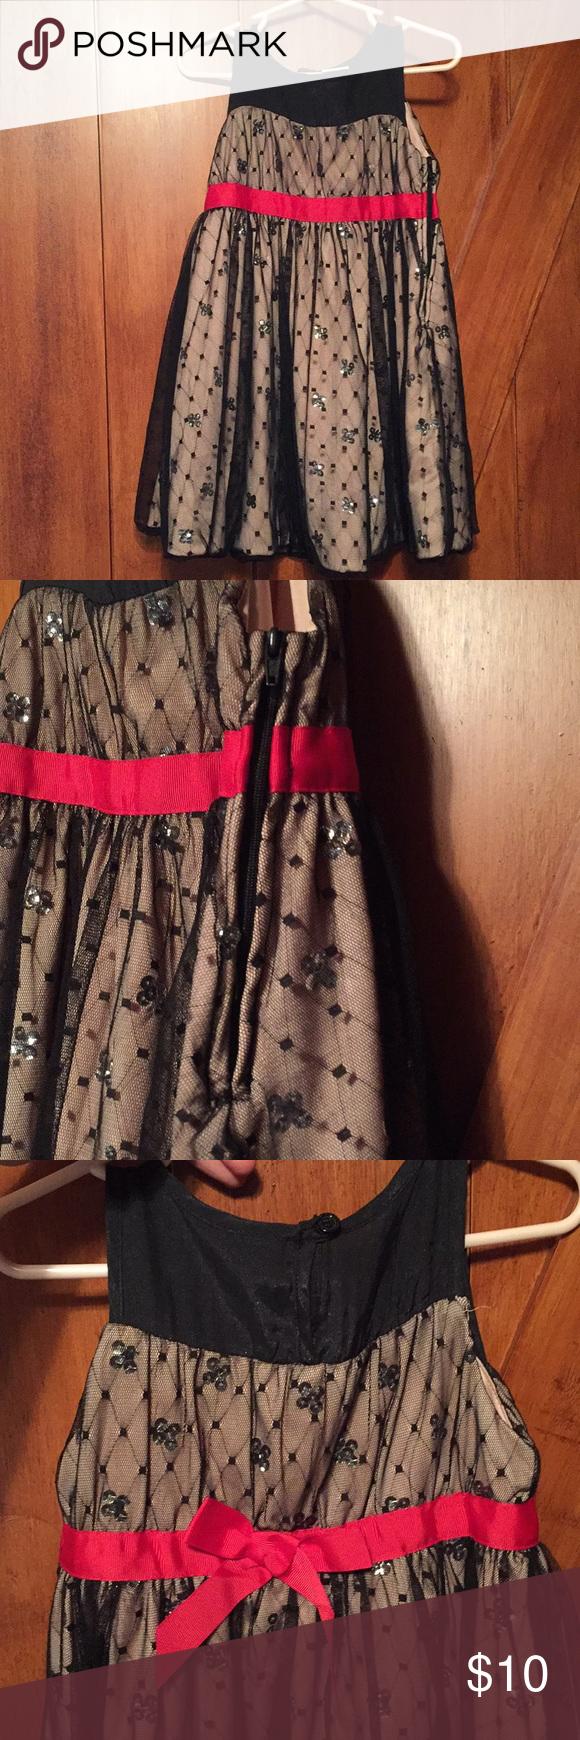 Girls Harajuku Mimi For Target Dress 4t Target Dresses Dresses 4t Dress [ 1740 x 580 Pixel ]